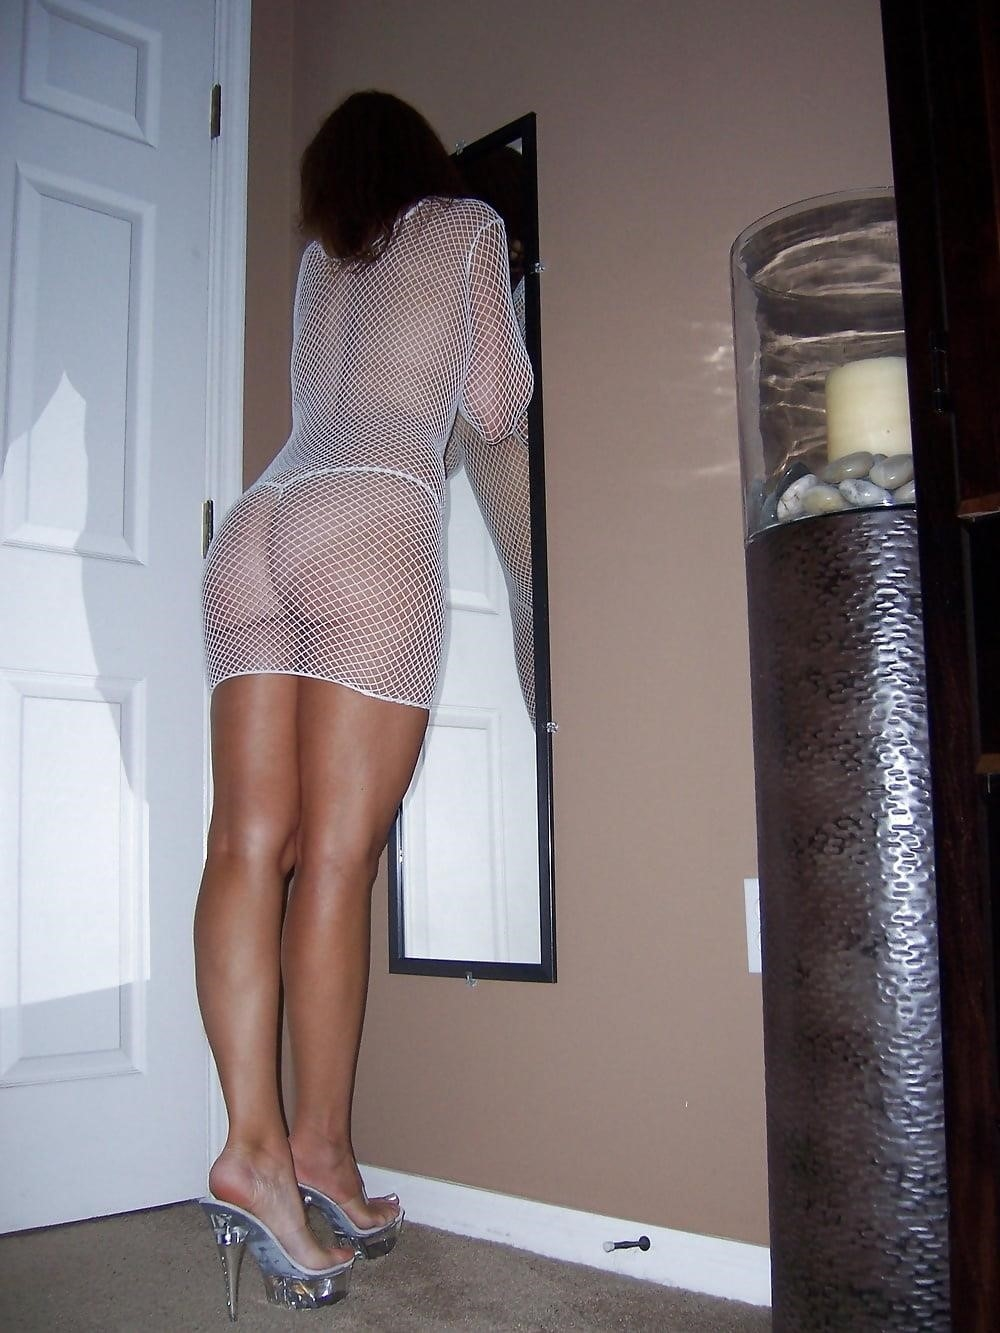 Jane the virgin sur netflix-3779